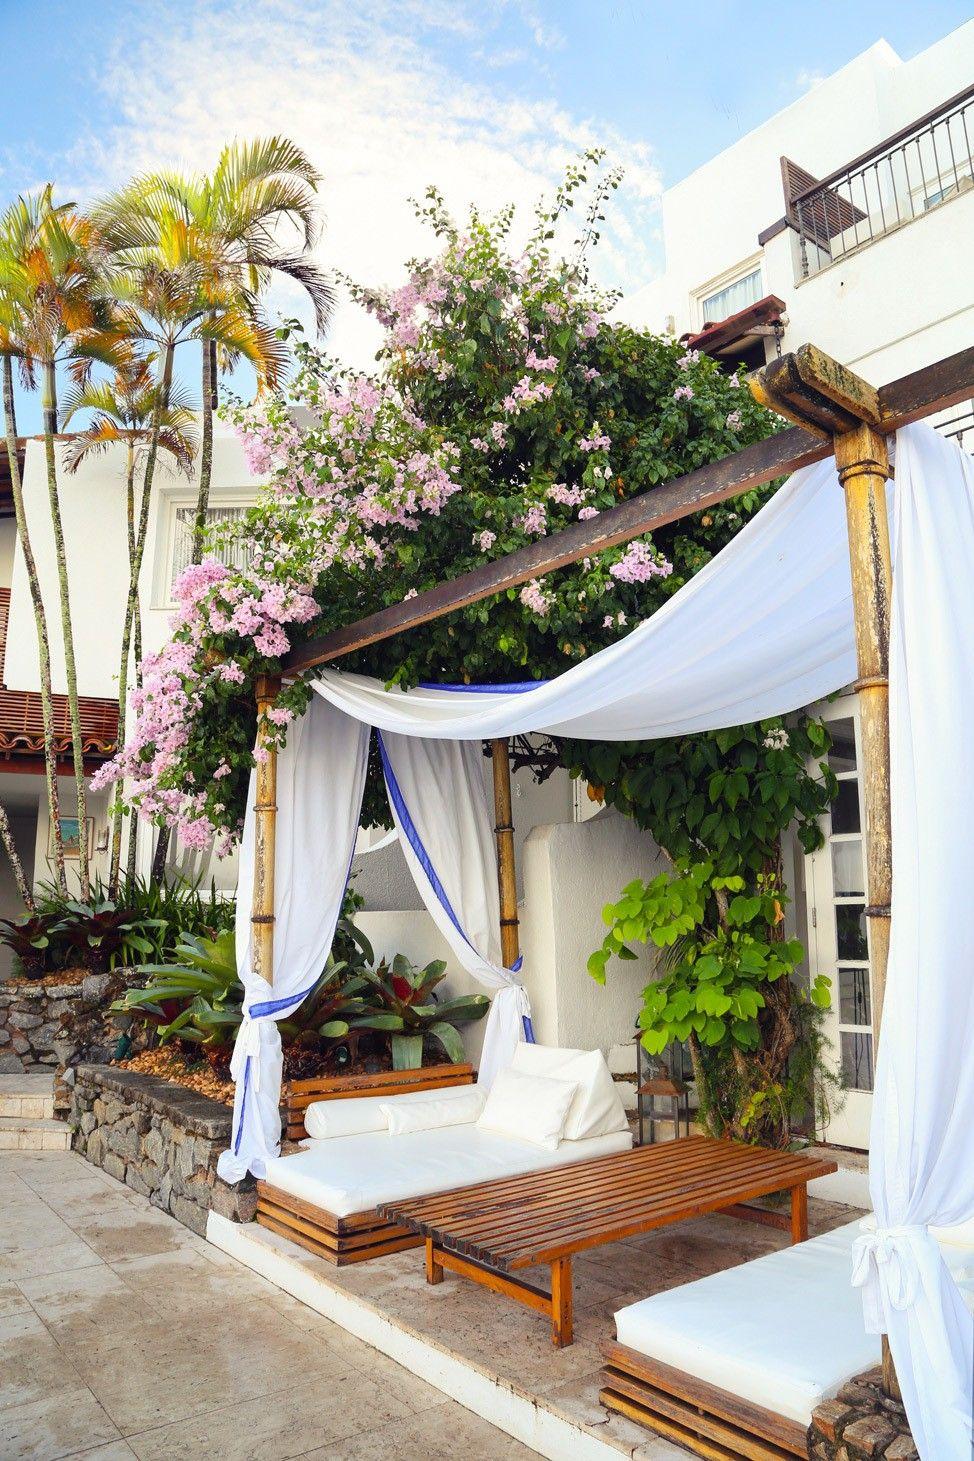 Hotel Crush Casas Brancas in Búzios Casas